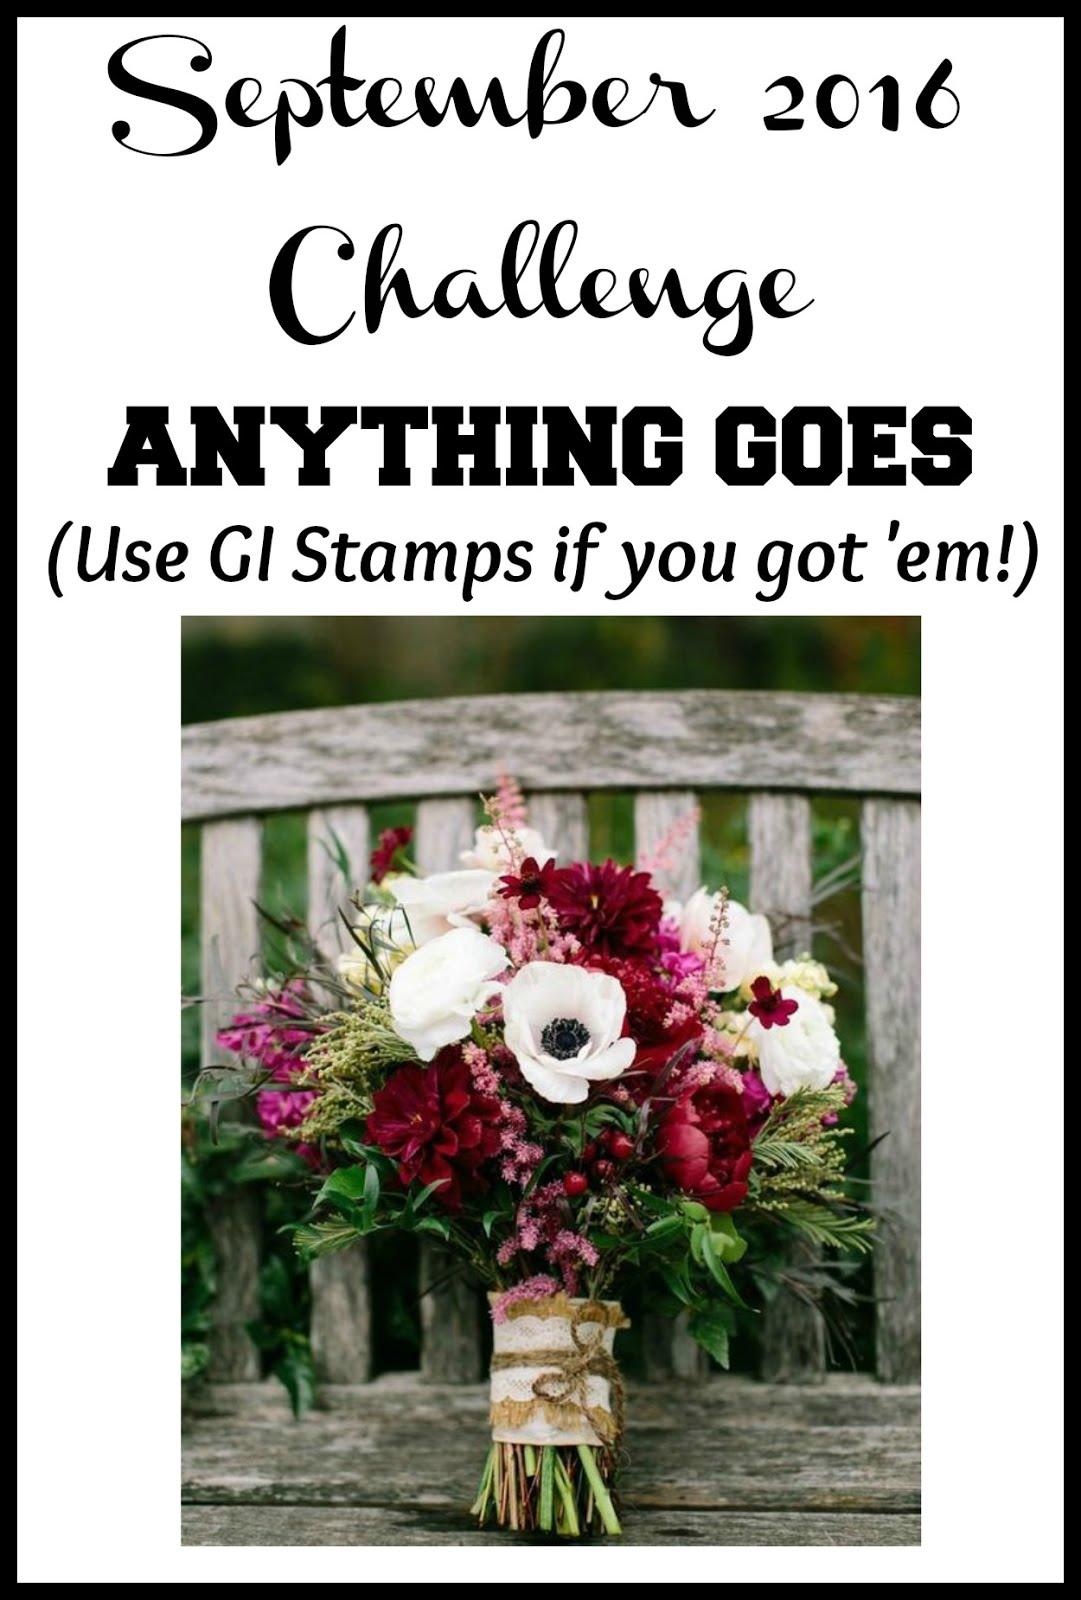 September GI Guest Challenge